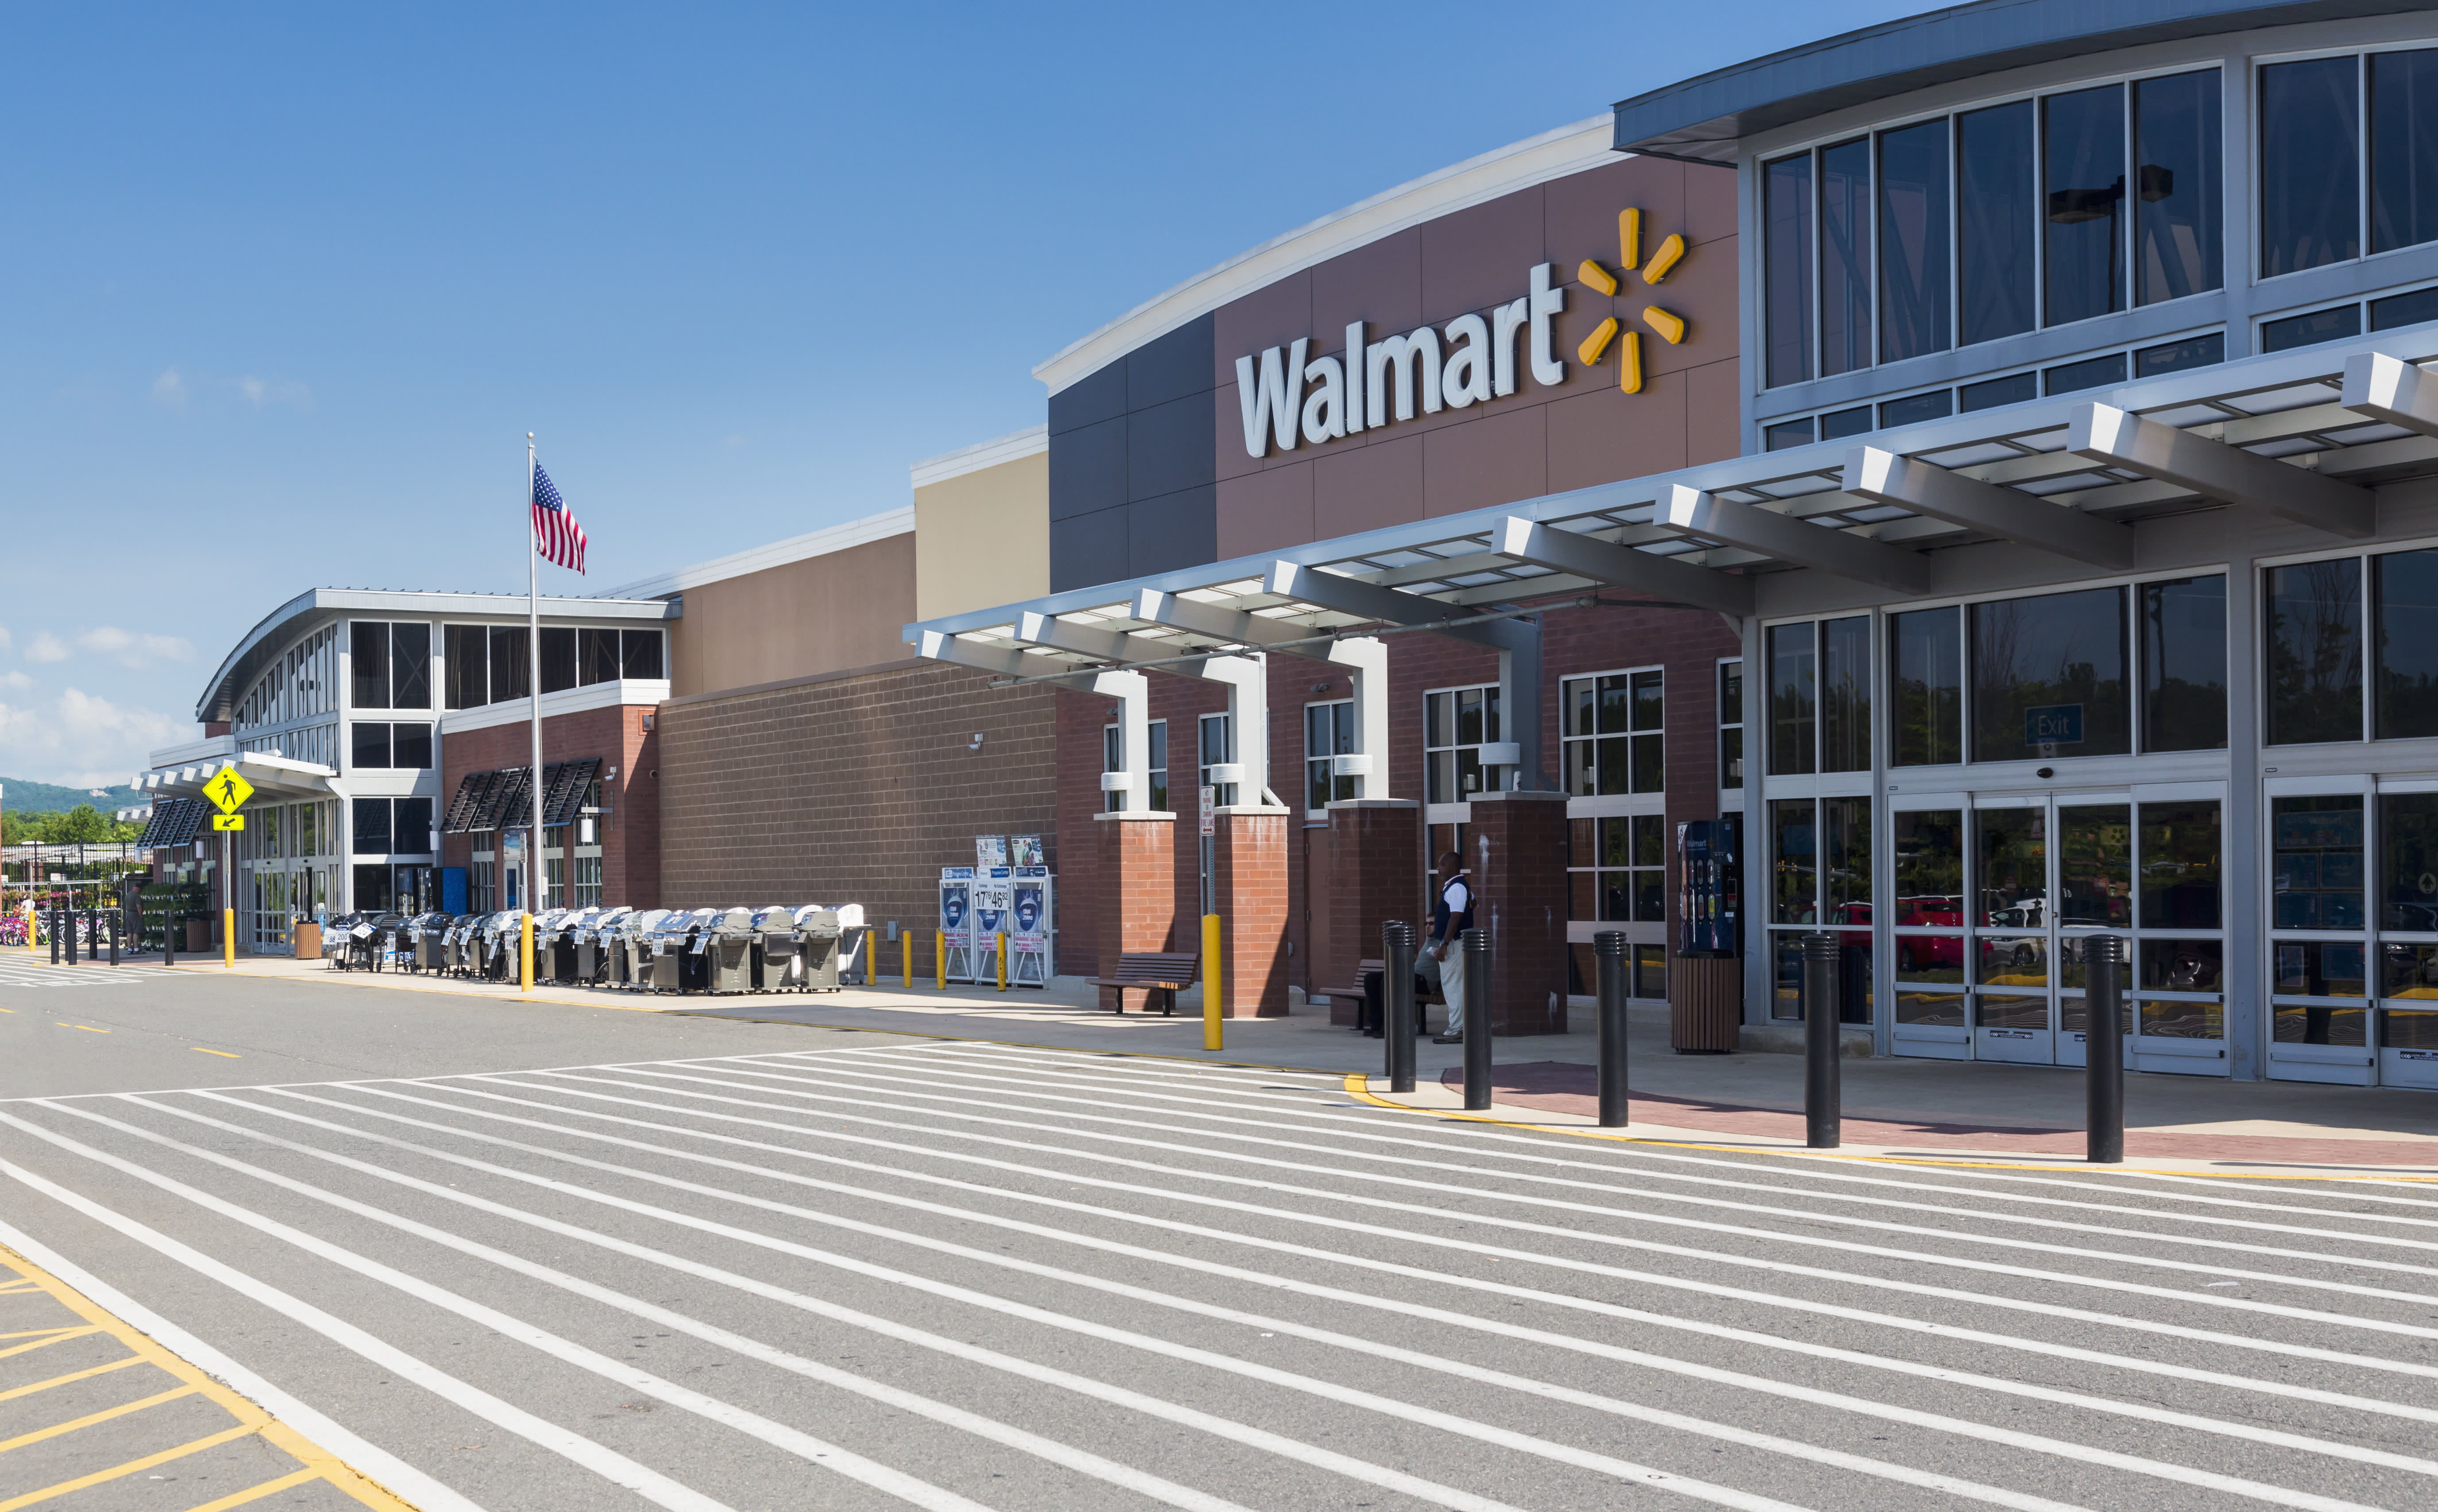 Treasury Secretary Steven Mnuchin spoke with Walmart's CFO about sourcing products away from China